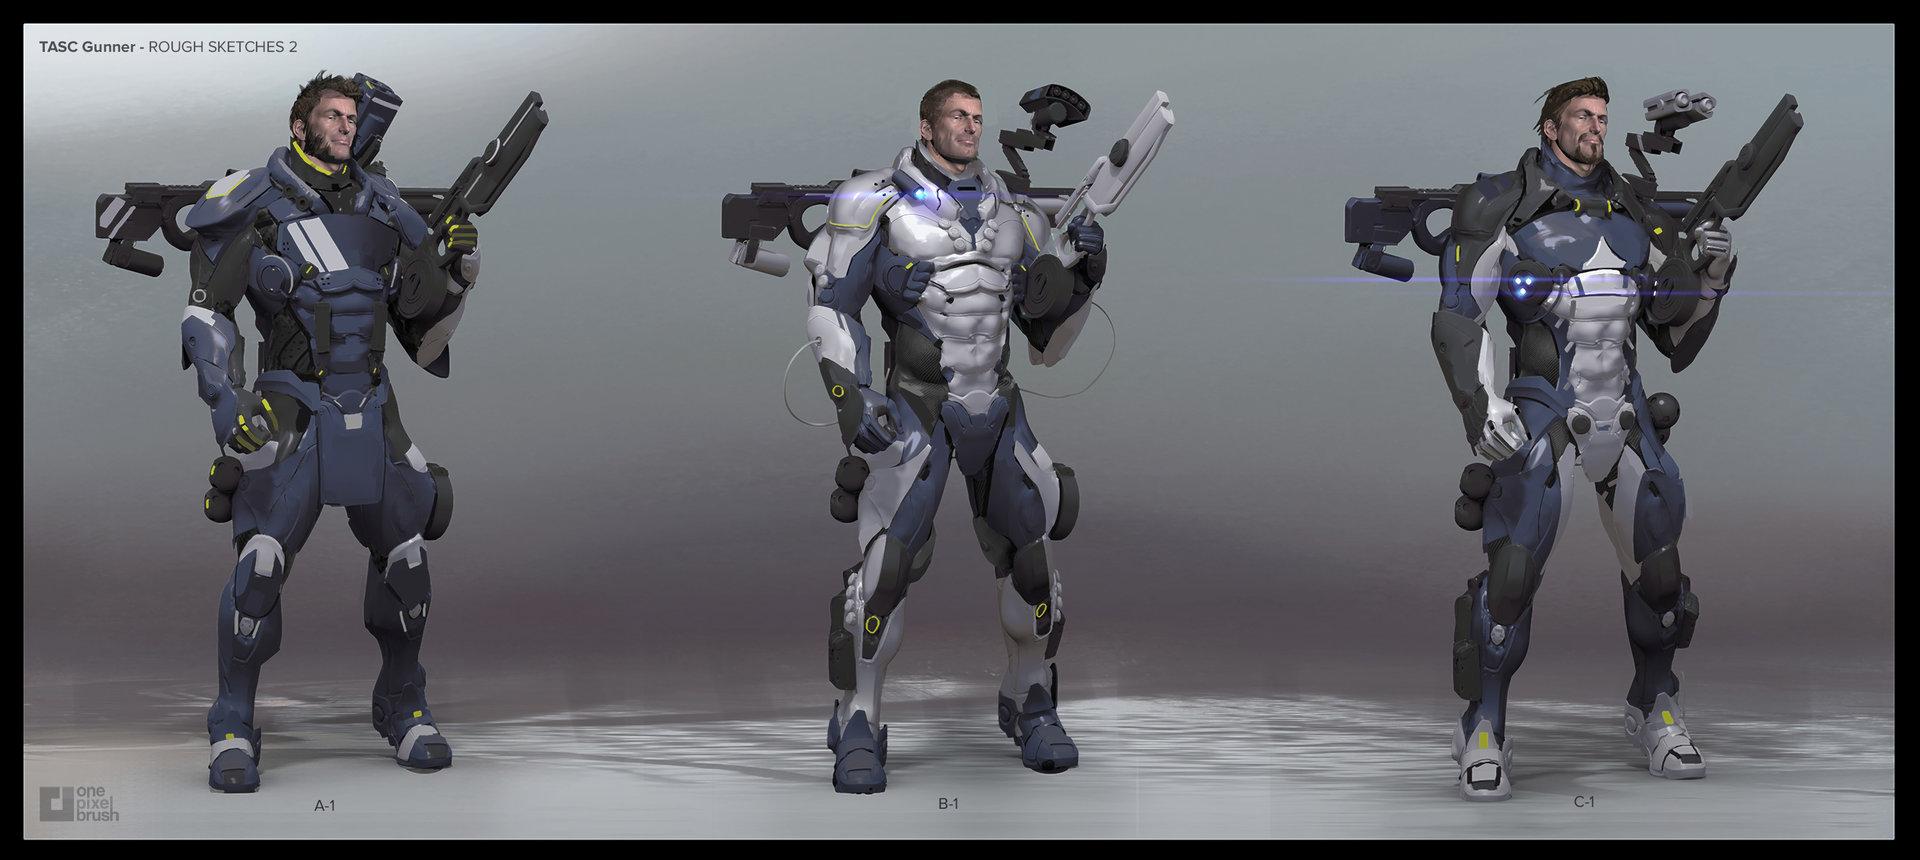 Boss key productions concept art depository blu tasc gunner 2